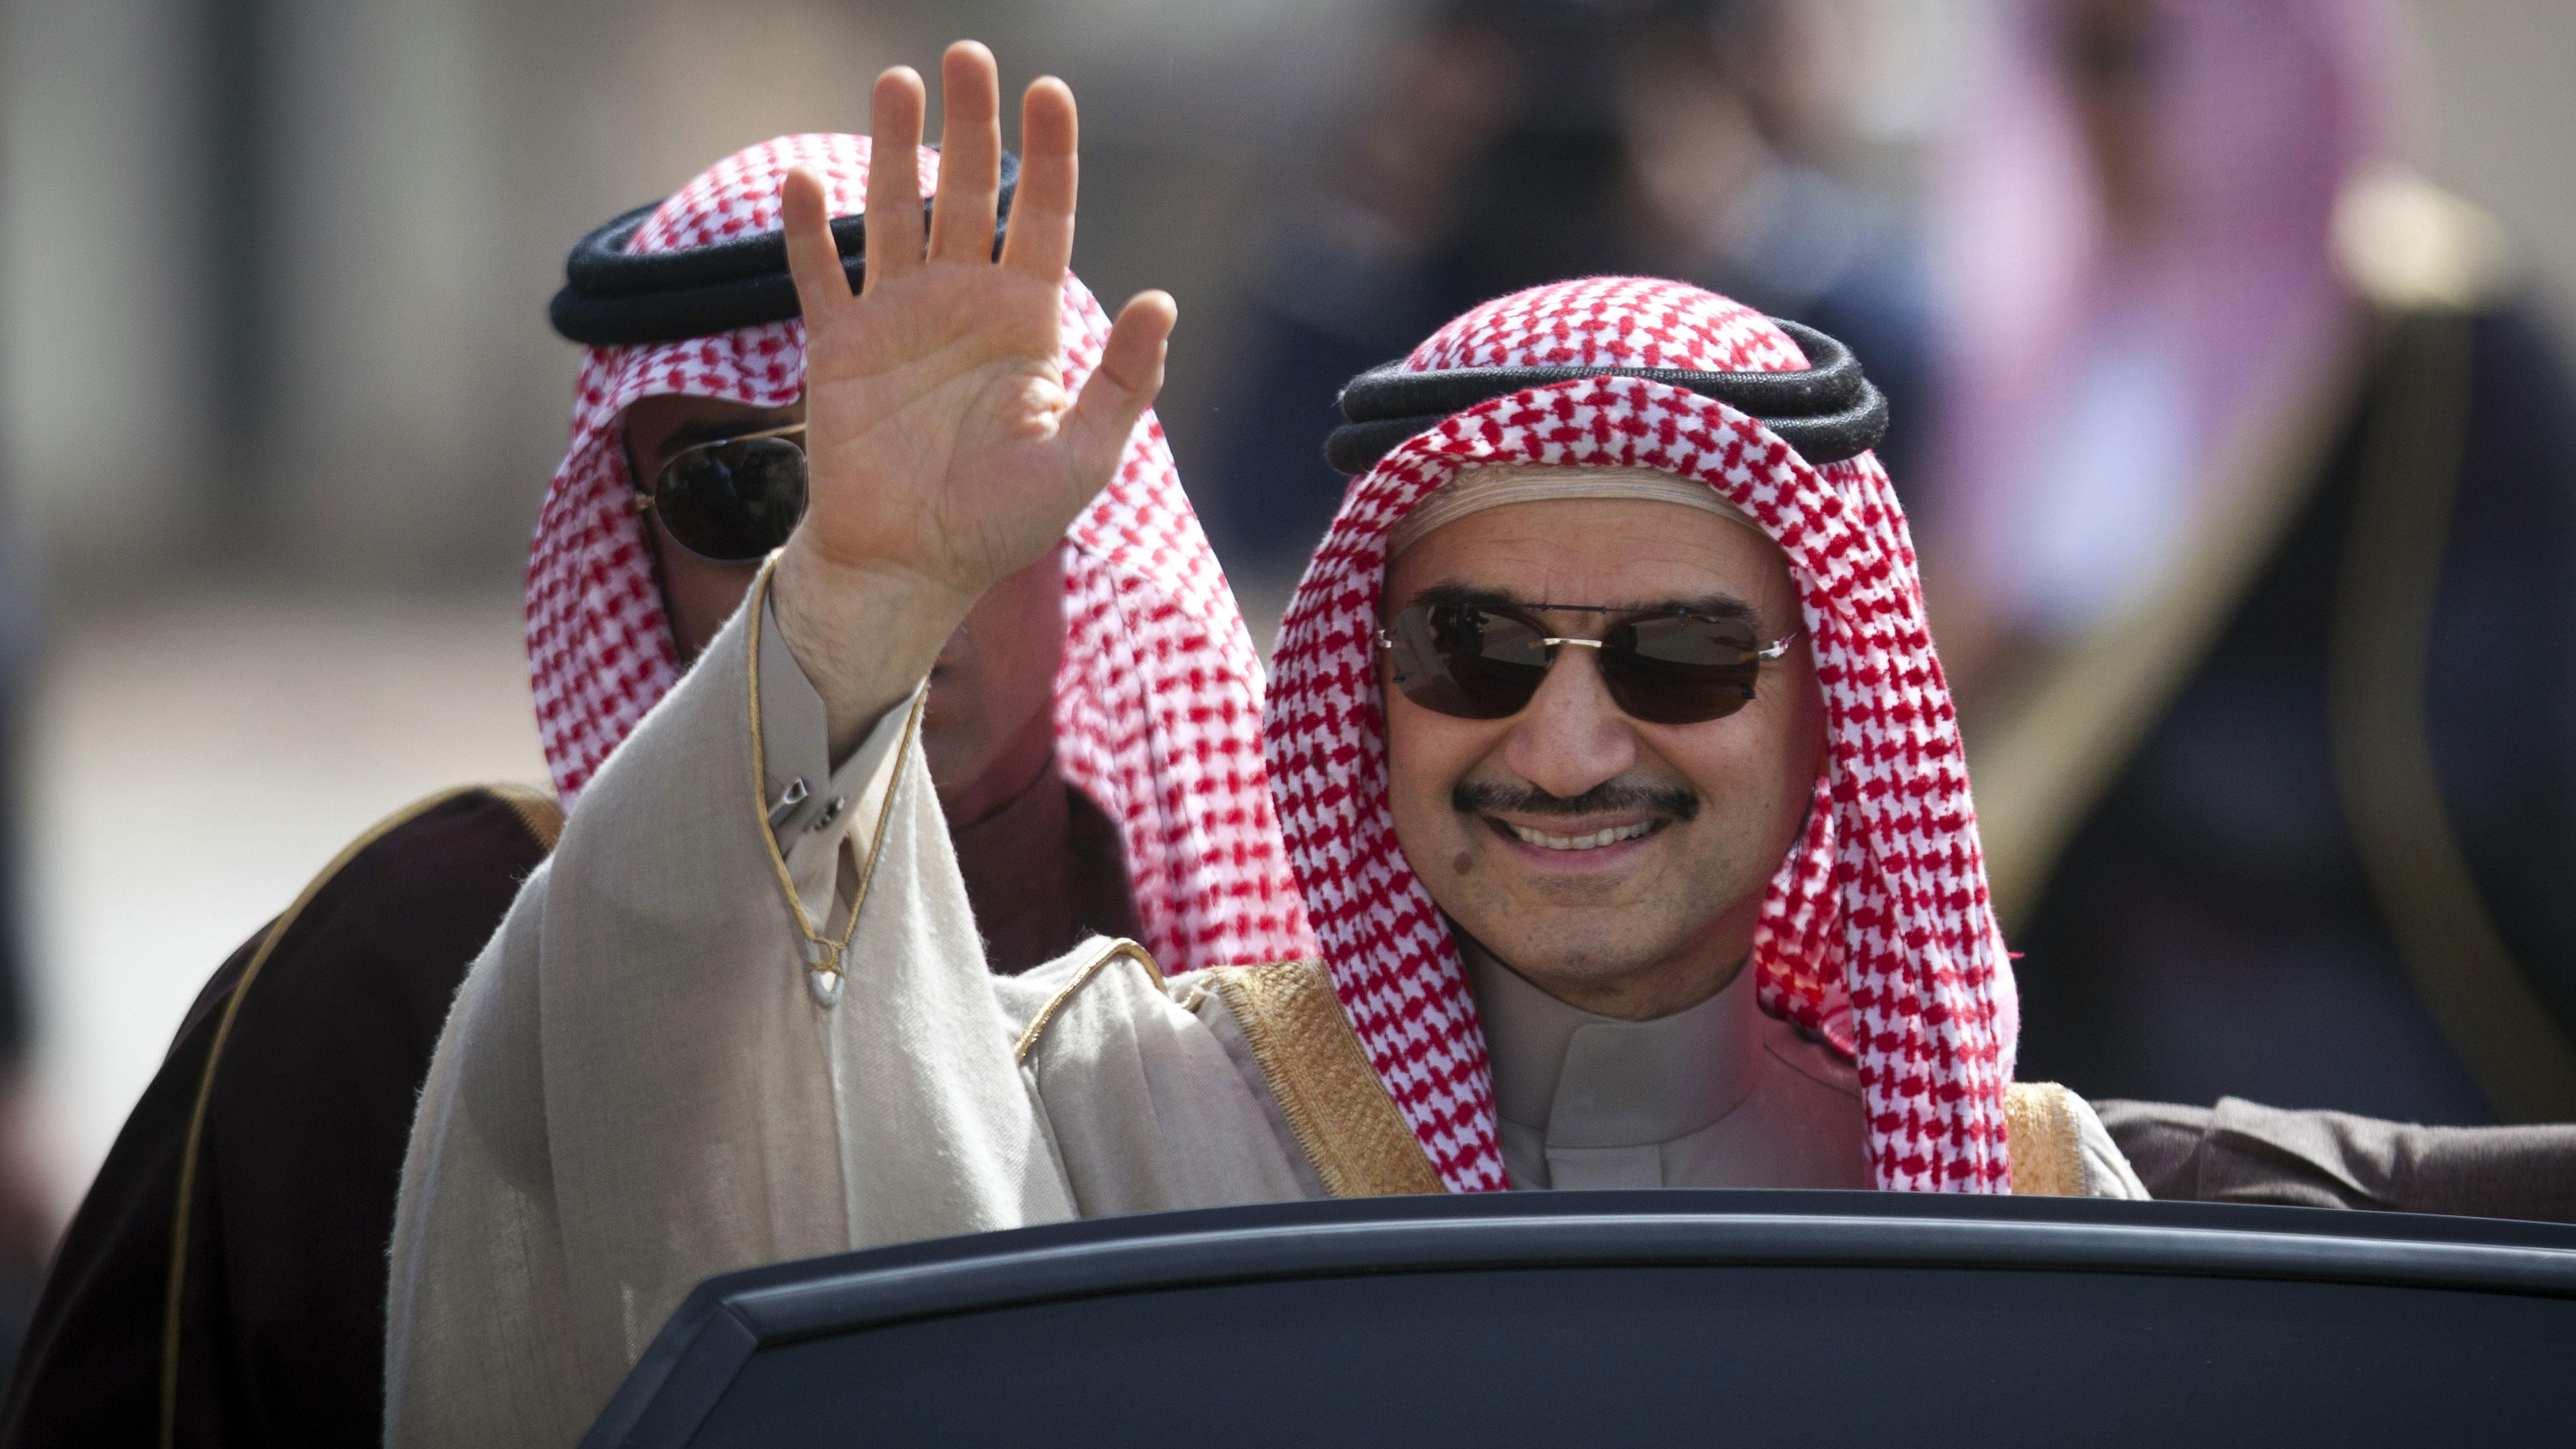 Billionaire Saudi Prince Alwaleed is now Twitter's second